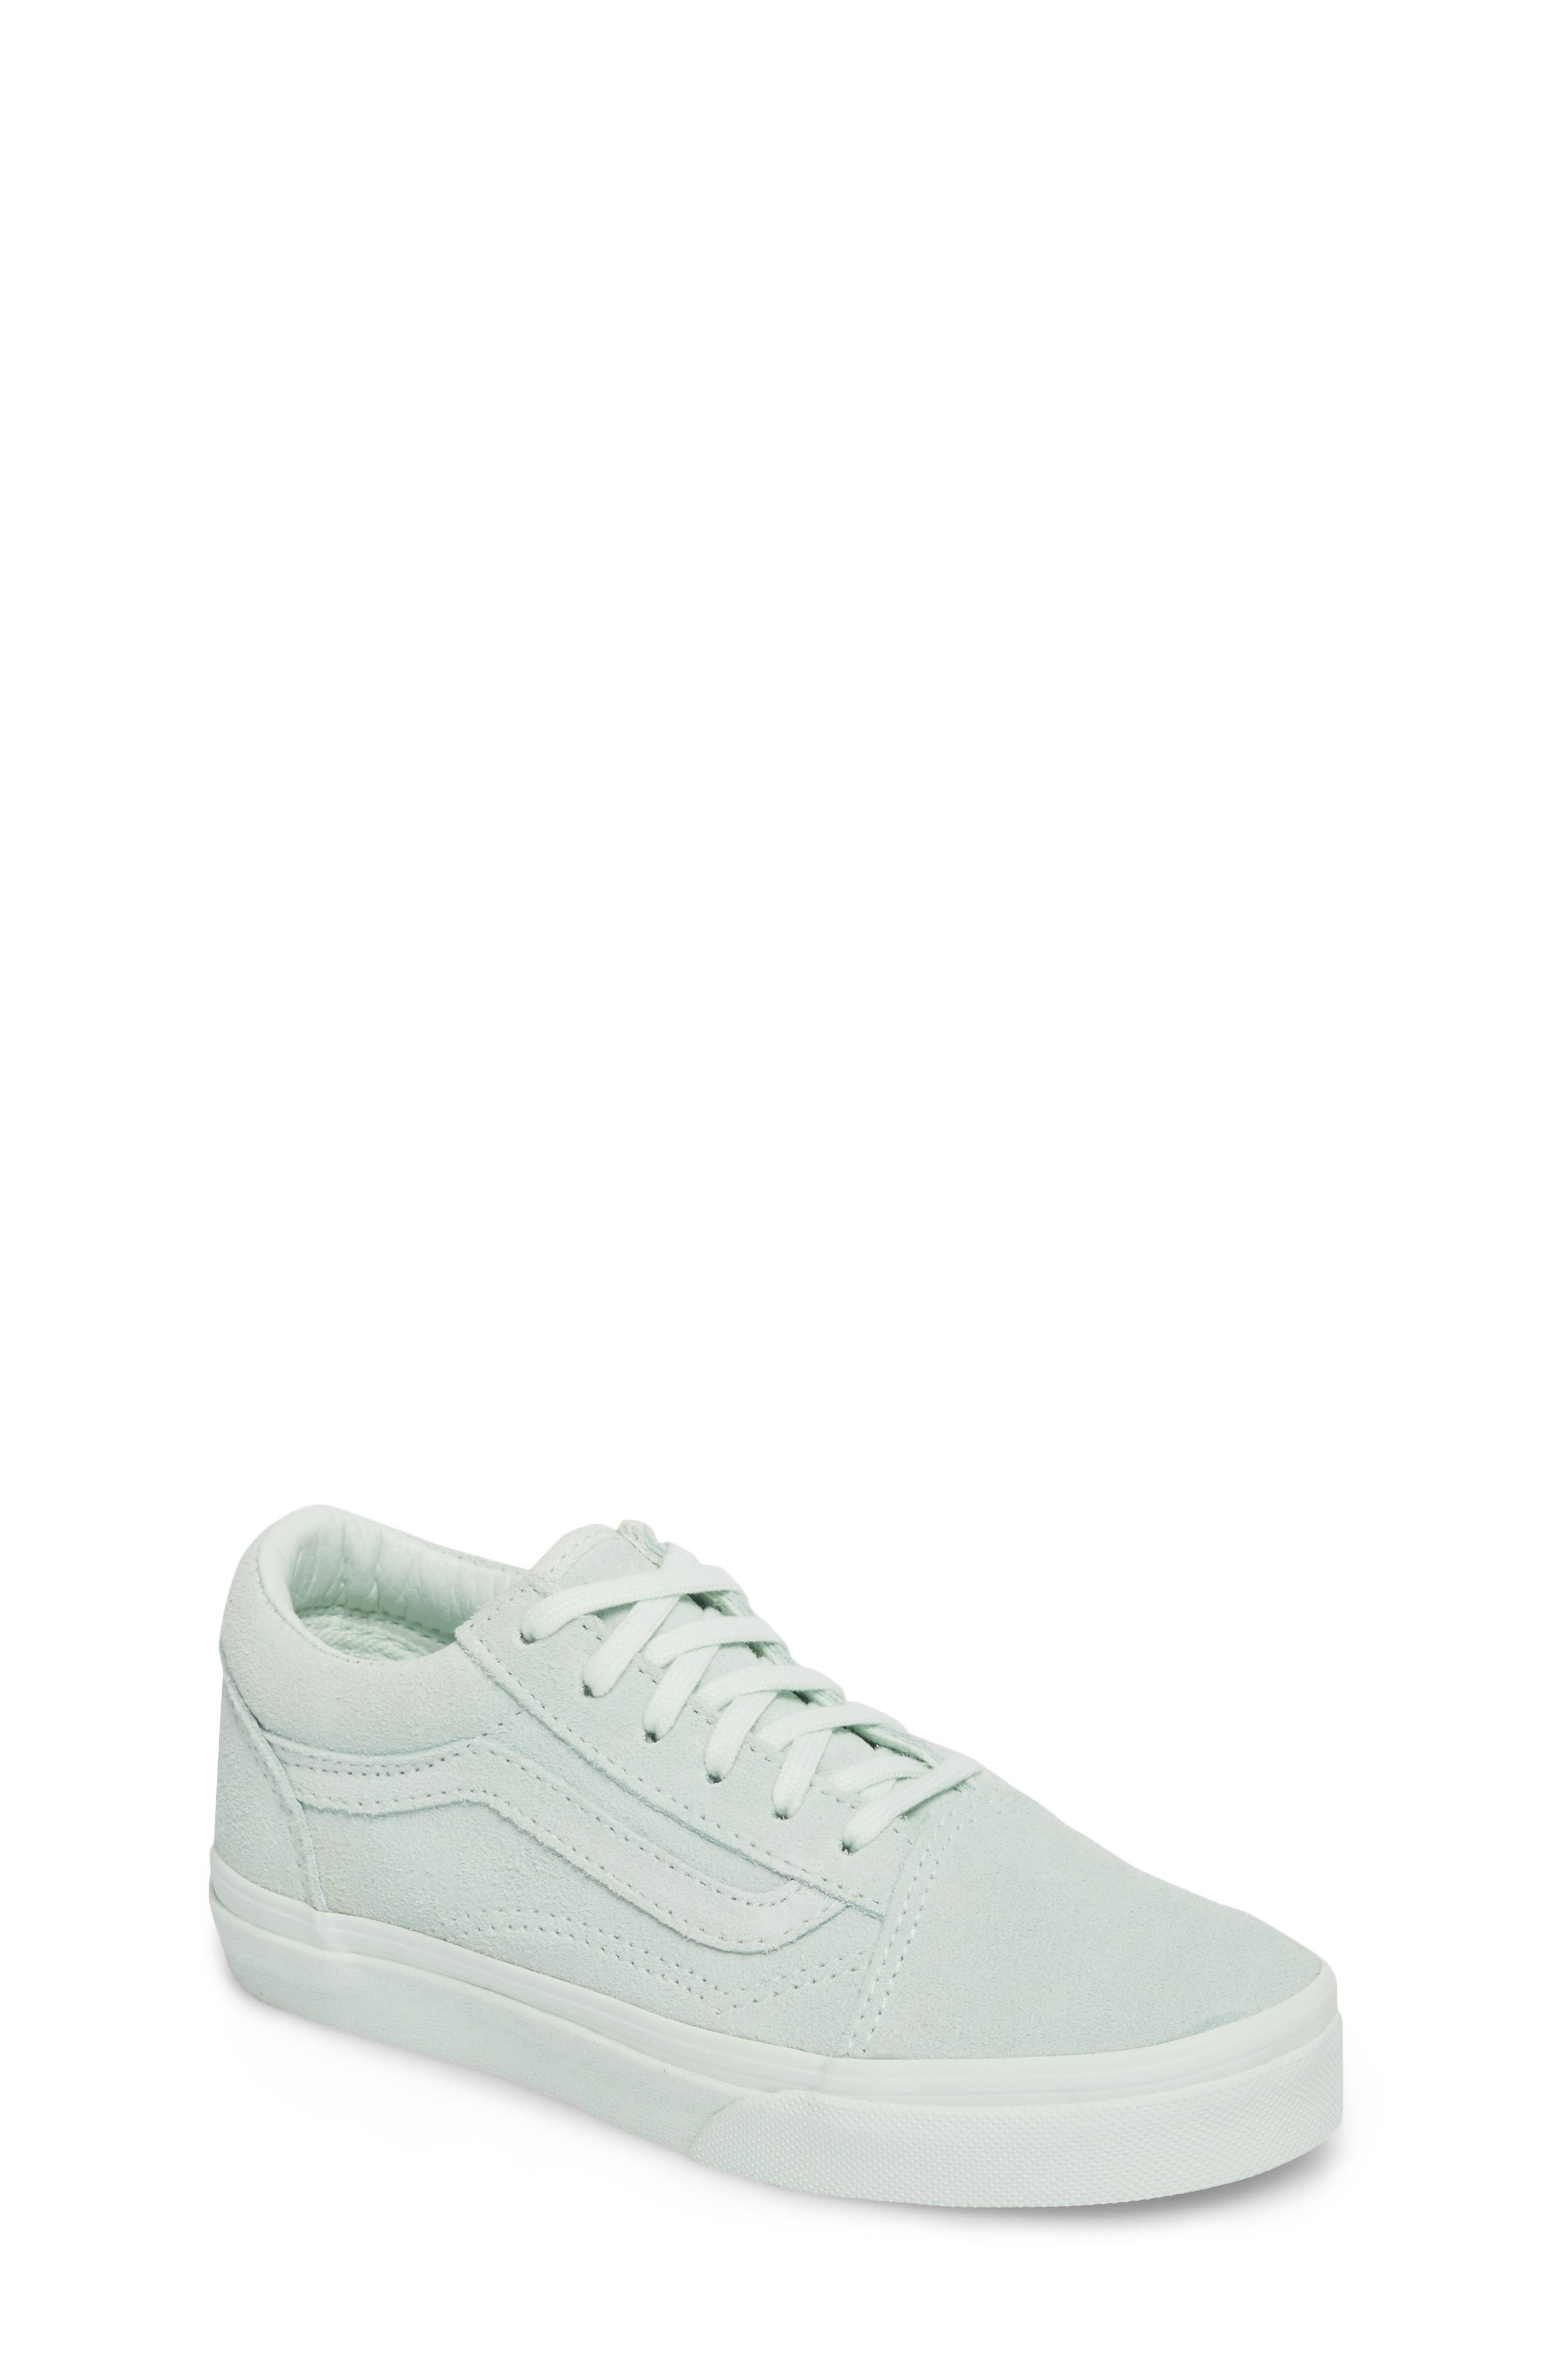 Old Skool Low Top Sneaker,                         Main,                         color, 300